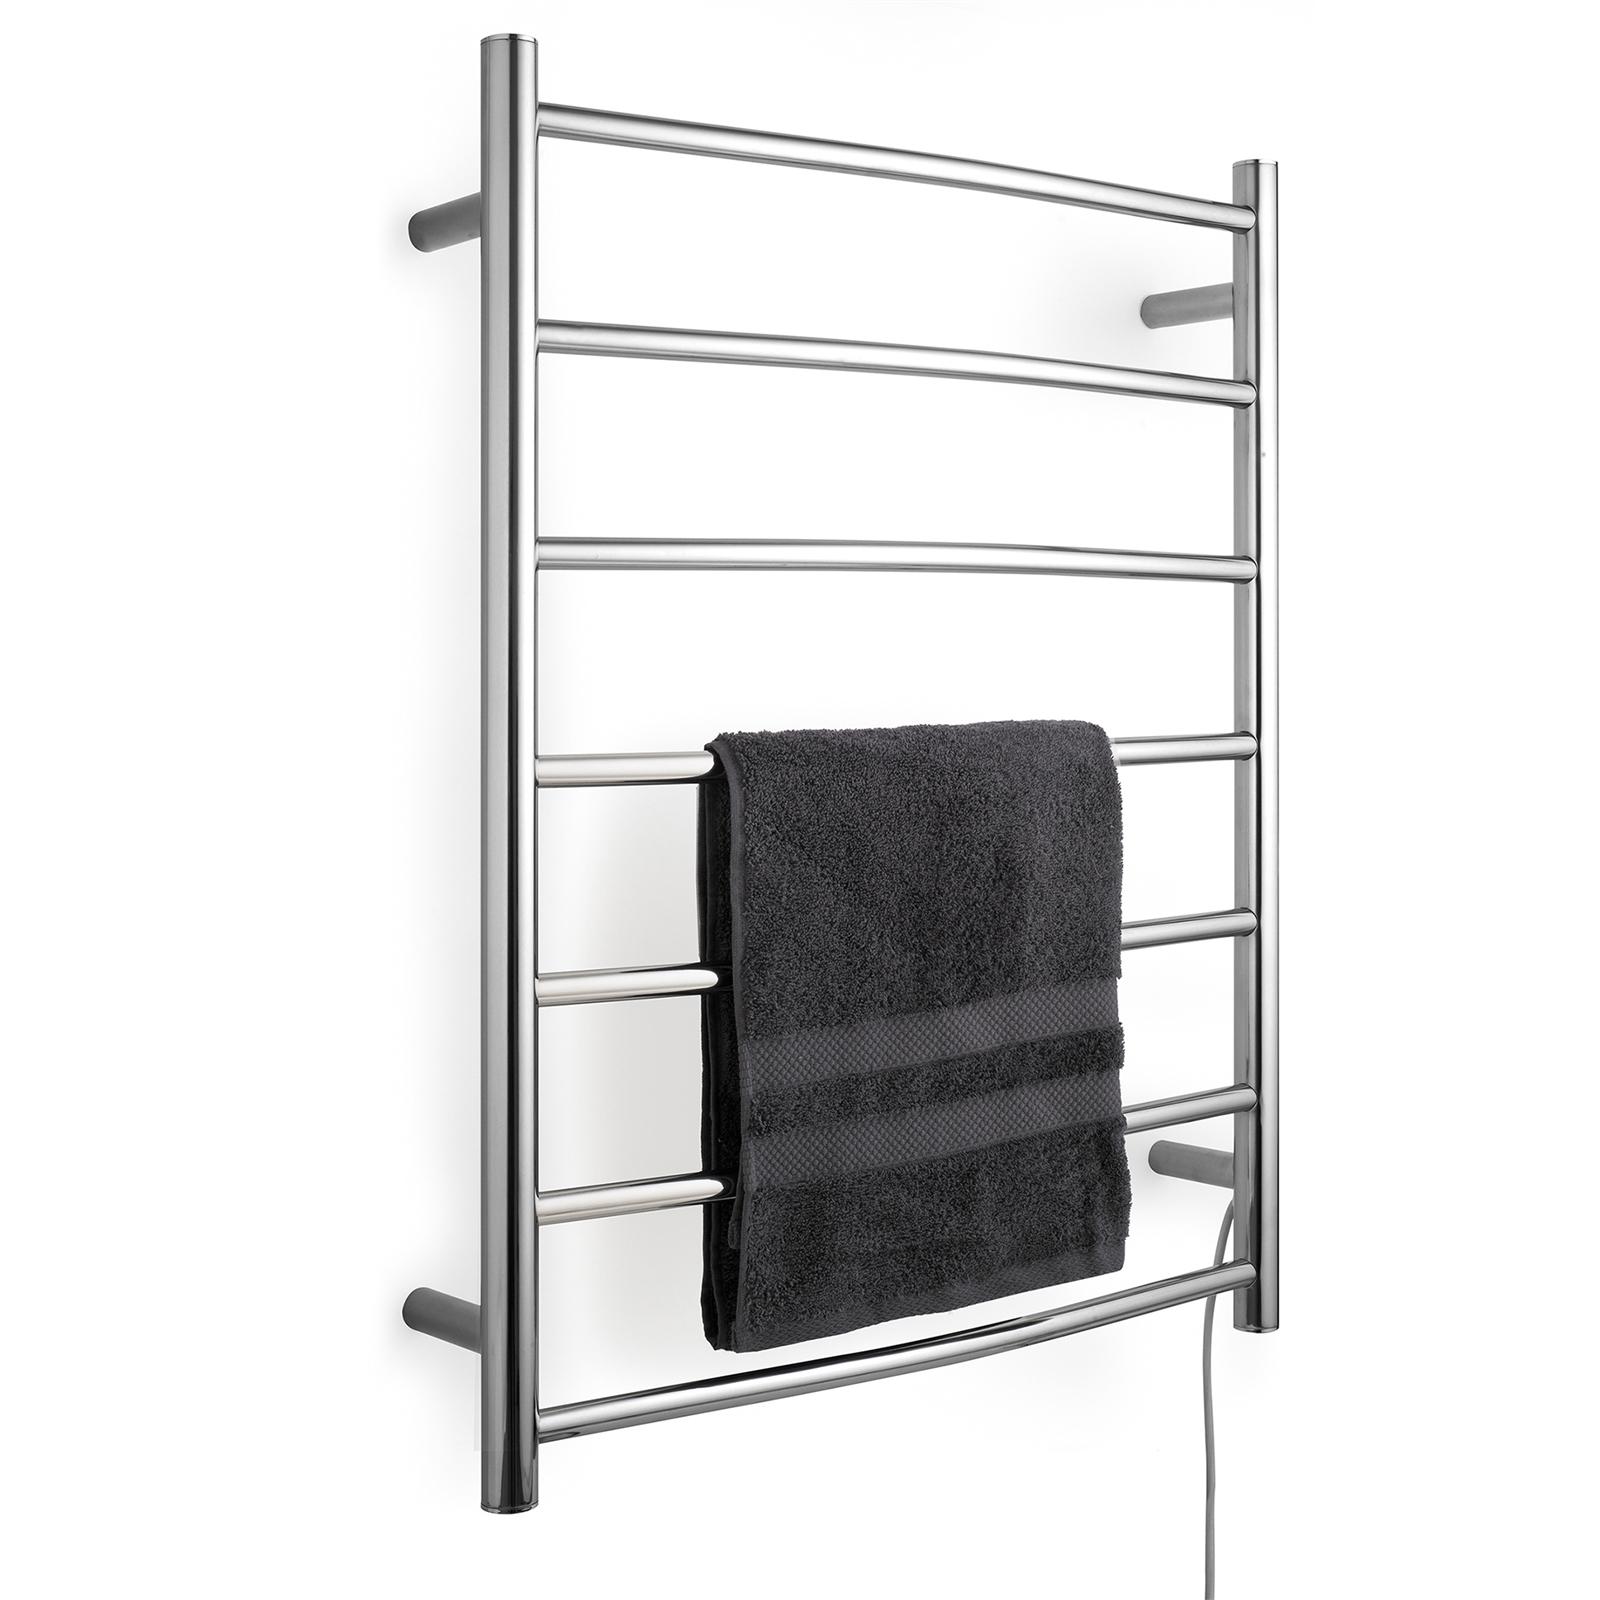 Arlec 7 Bar 70W Stainless Steel  Curved Heated Towel Rail